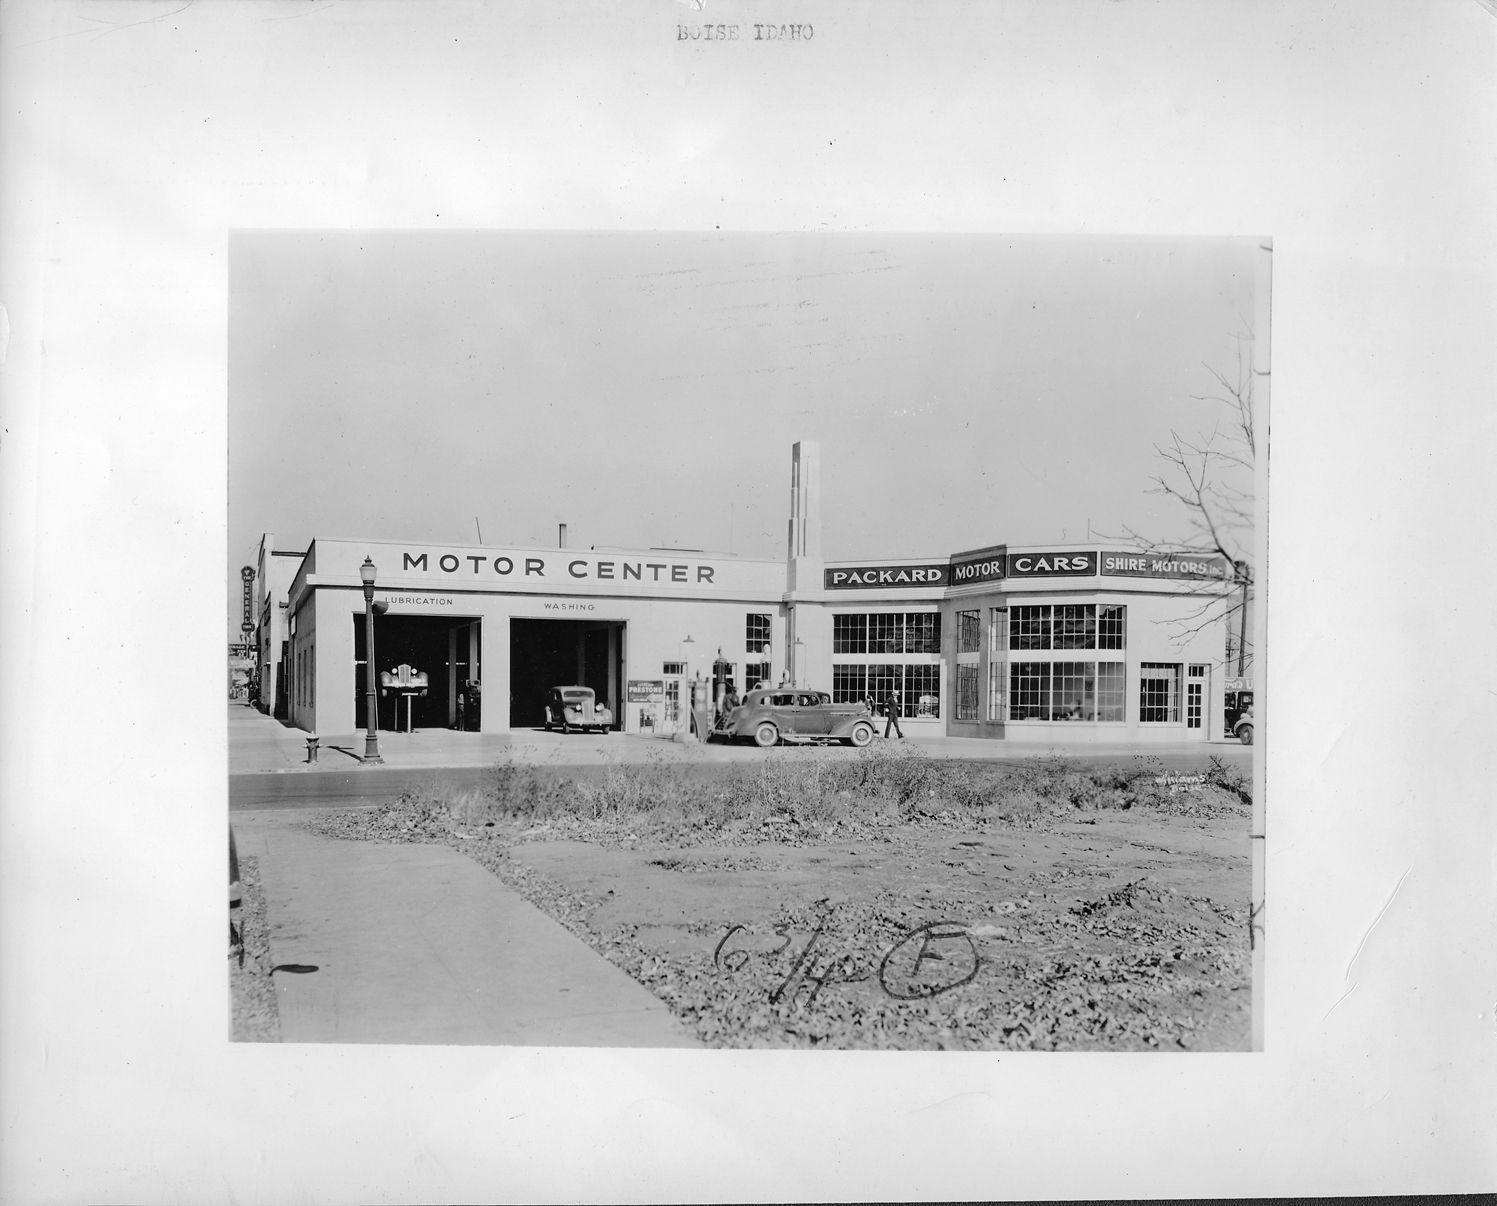 Car Dealerships In Boise Idaho >> Packard dealership, Boise, Idaho, 1938   DPL DAMS   Packard, Dealership, Car dealership